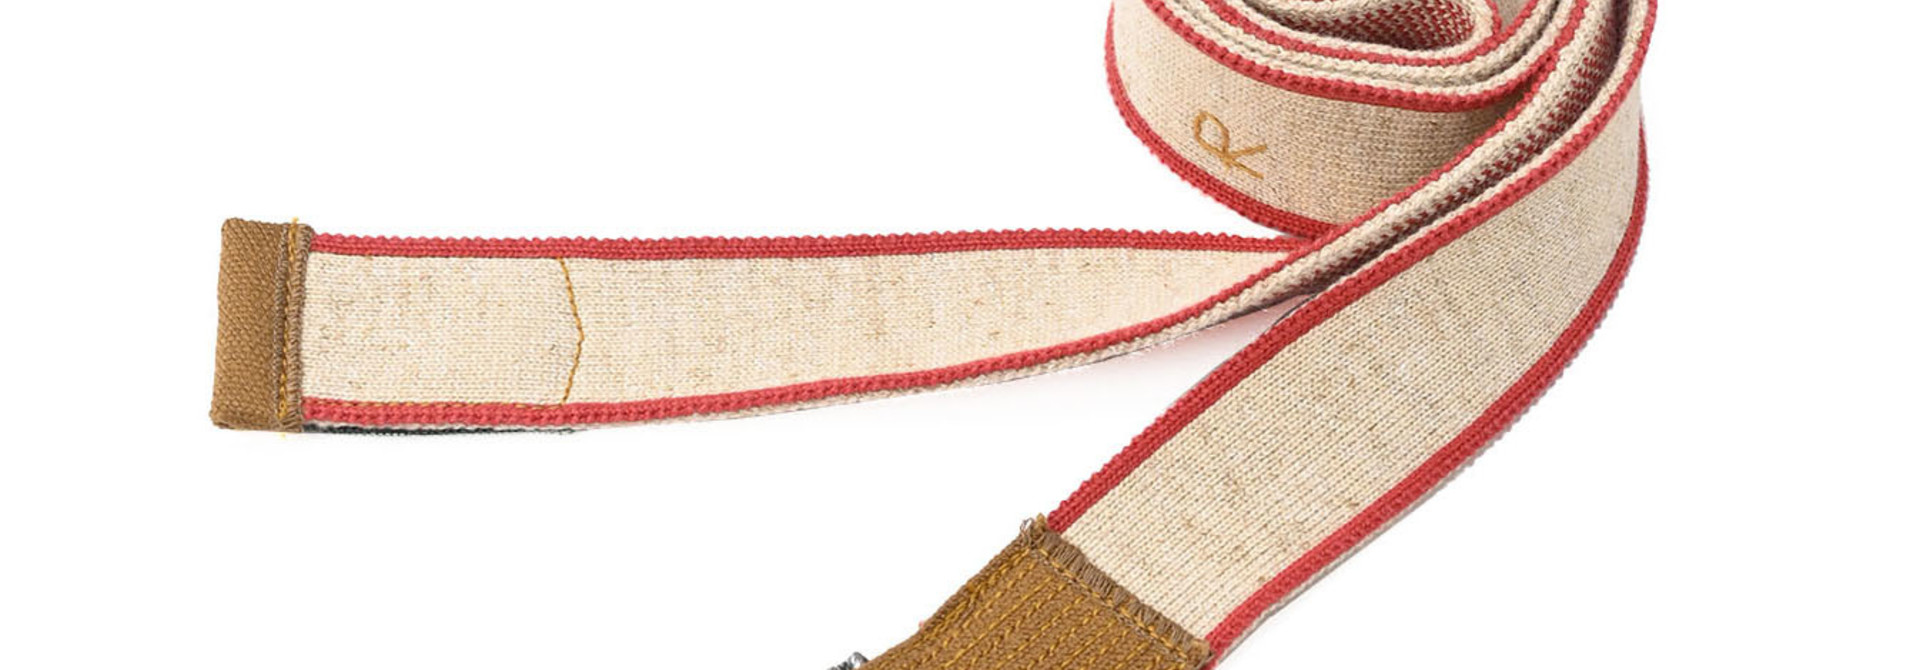 Selvage Knit Belt